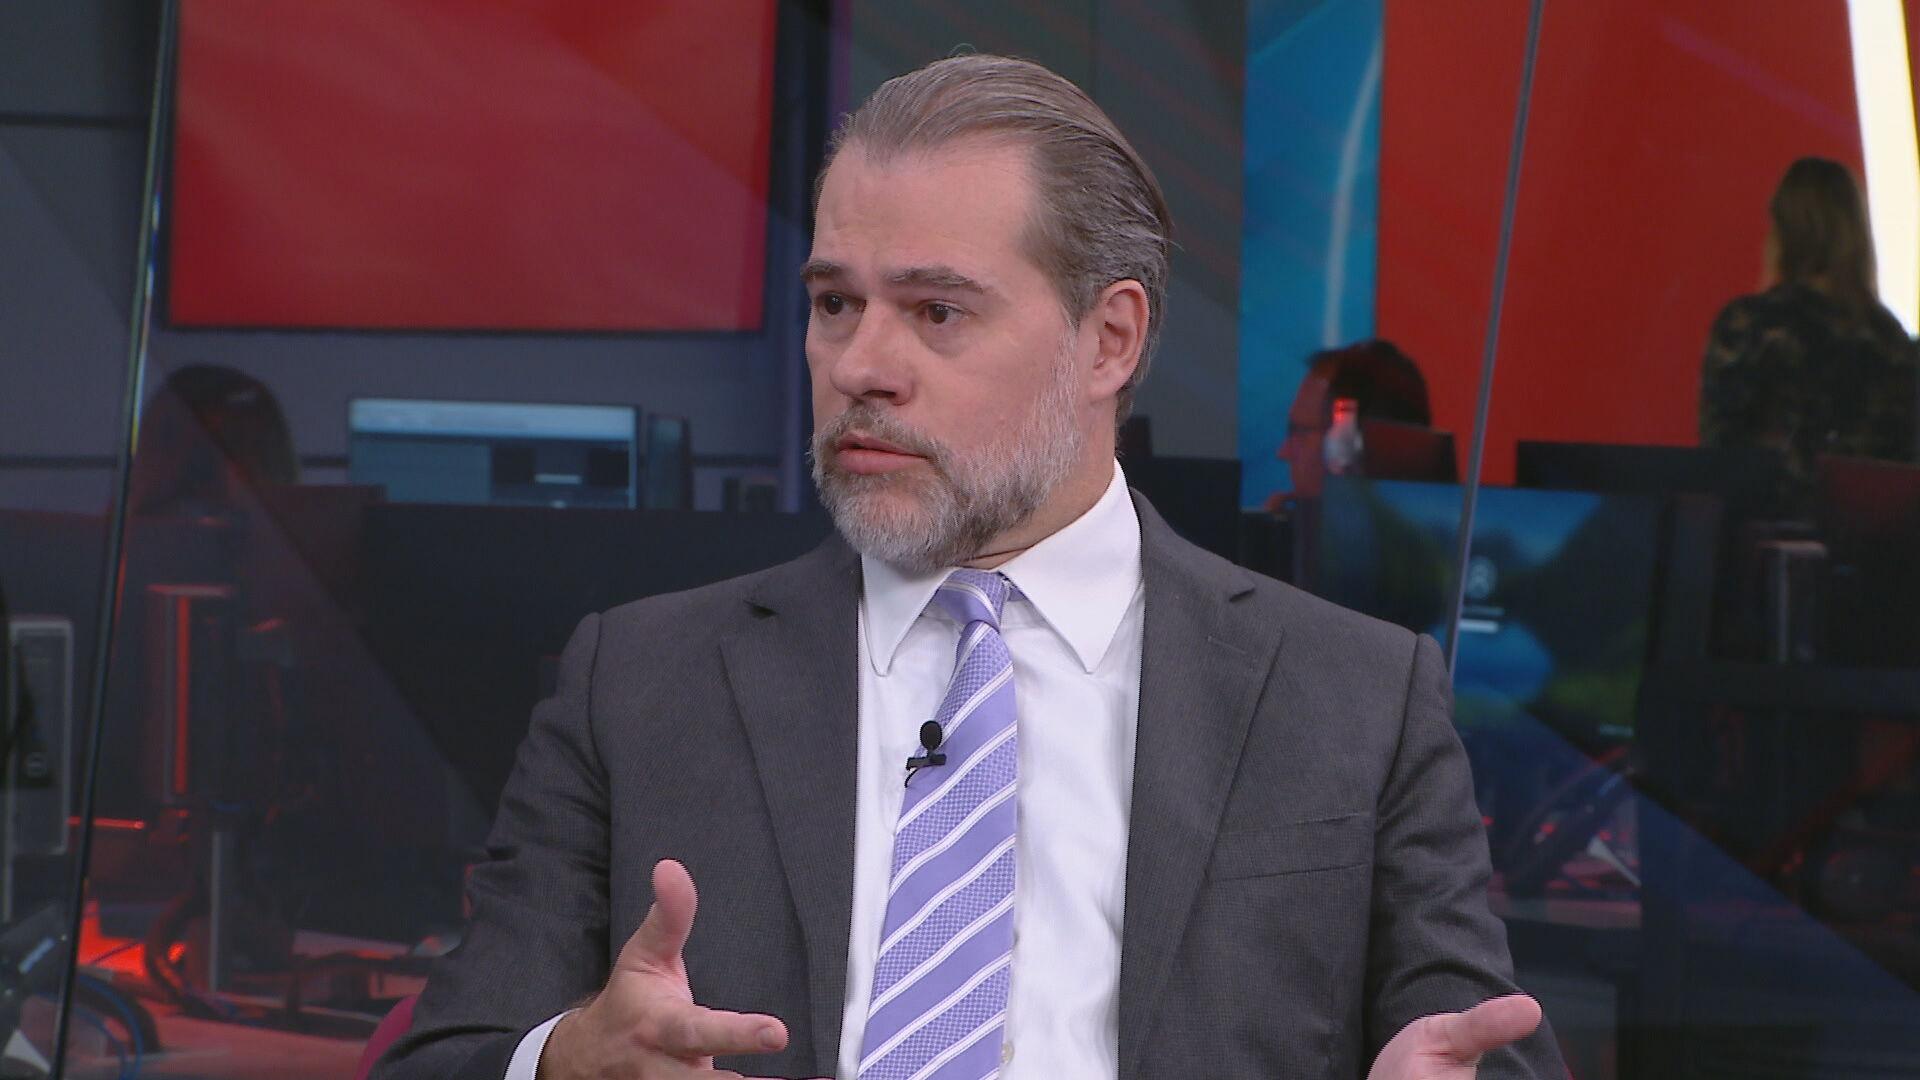 Ministro Dias Toffoli, presidente do STF, em entrevista à CNN Brasil